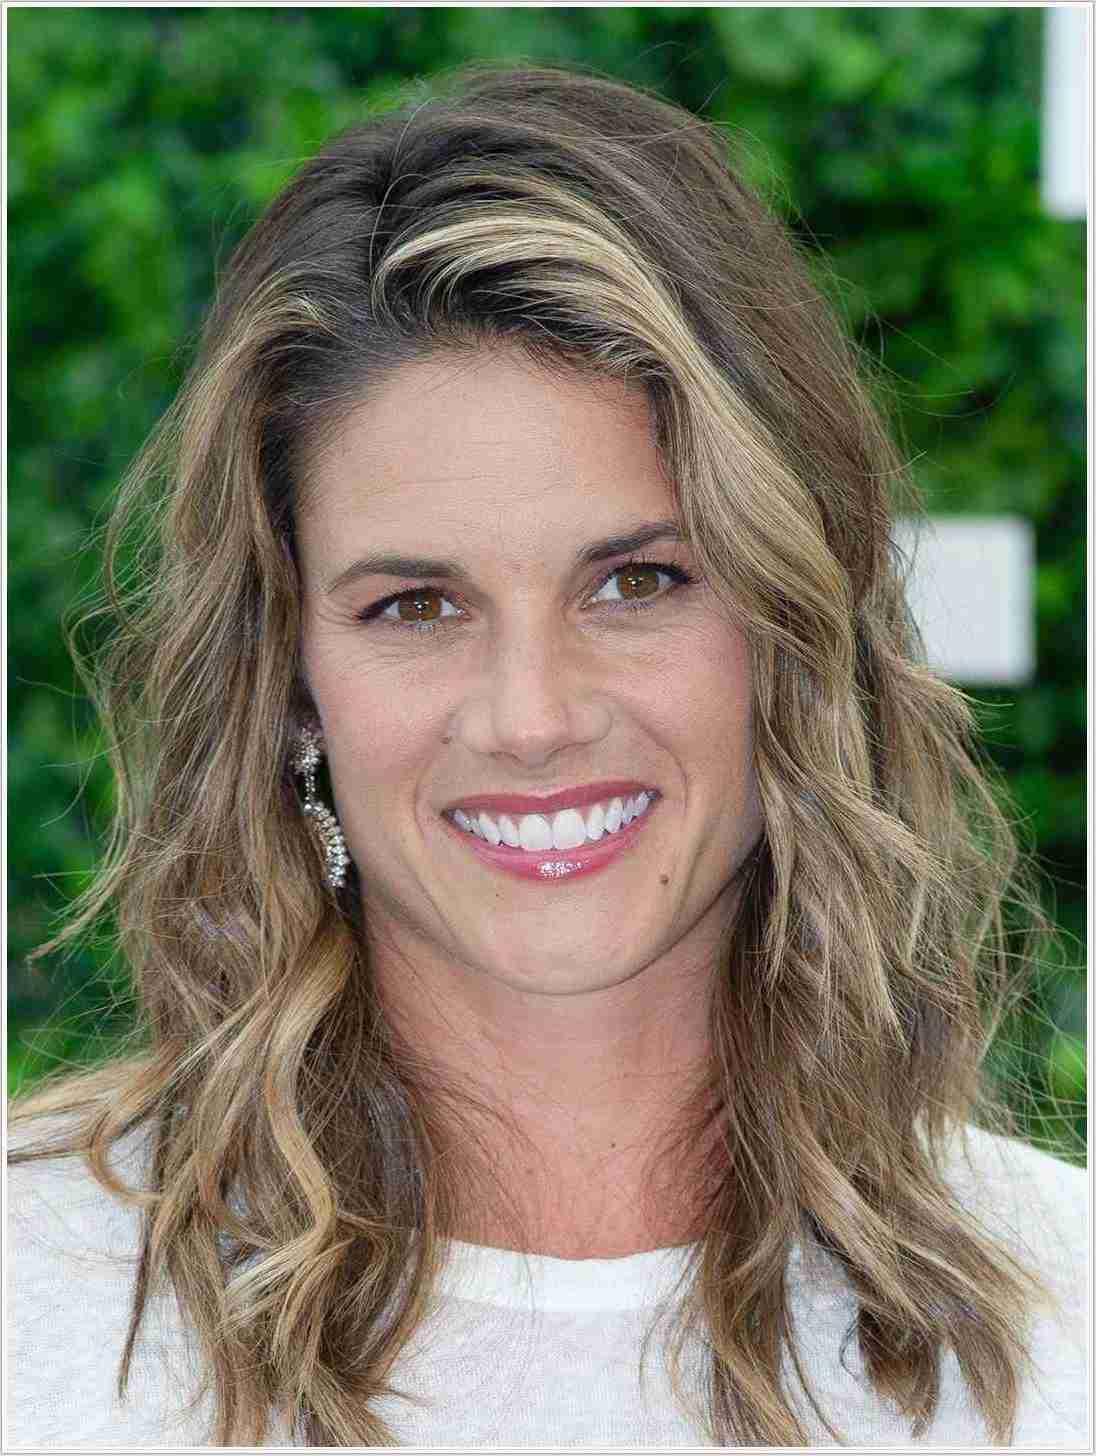 Missy Peregrym Net Worth, Bio, Height, Family, Age, Weight